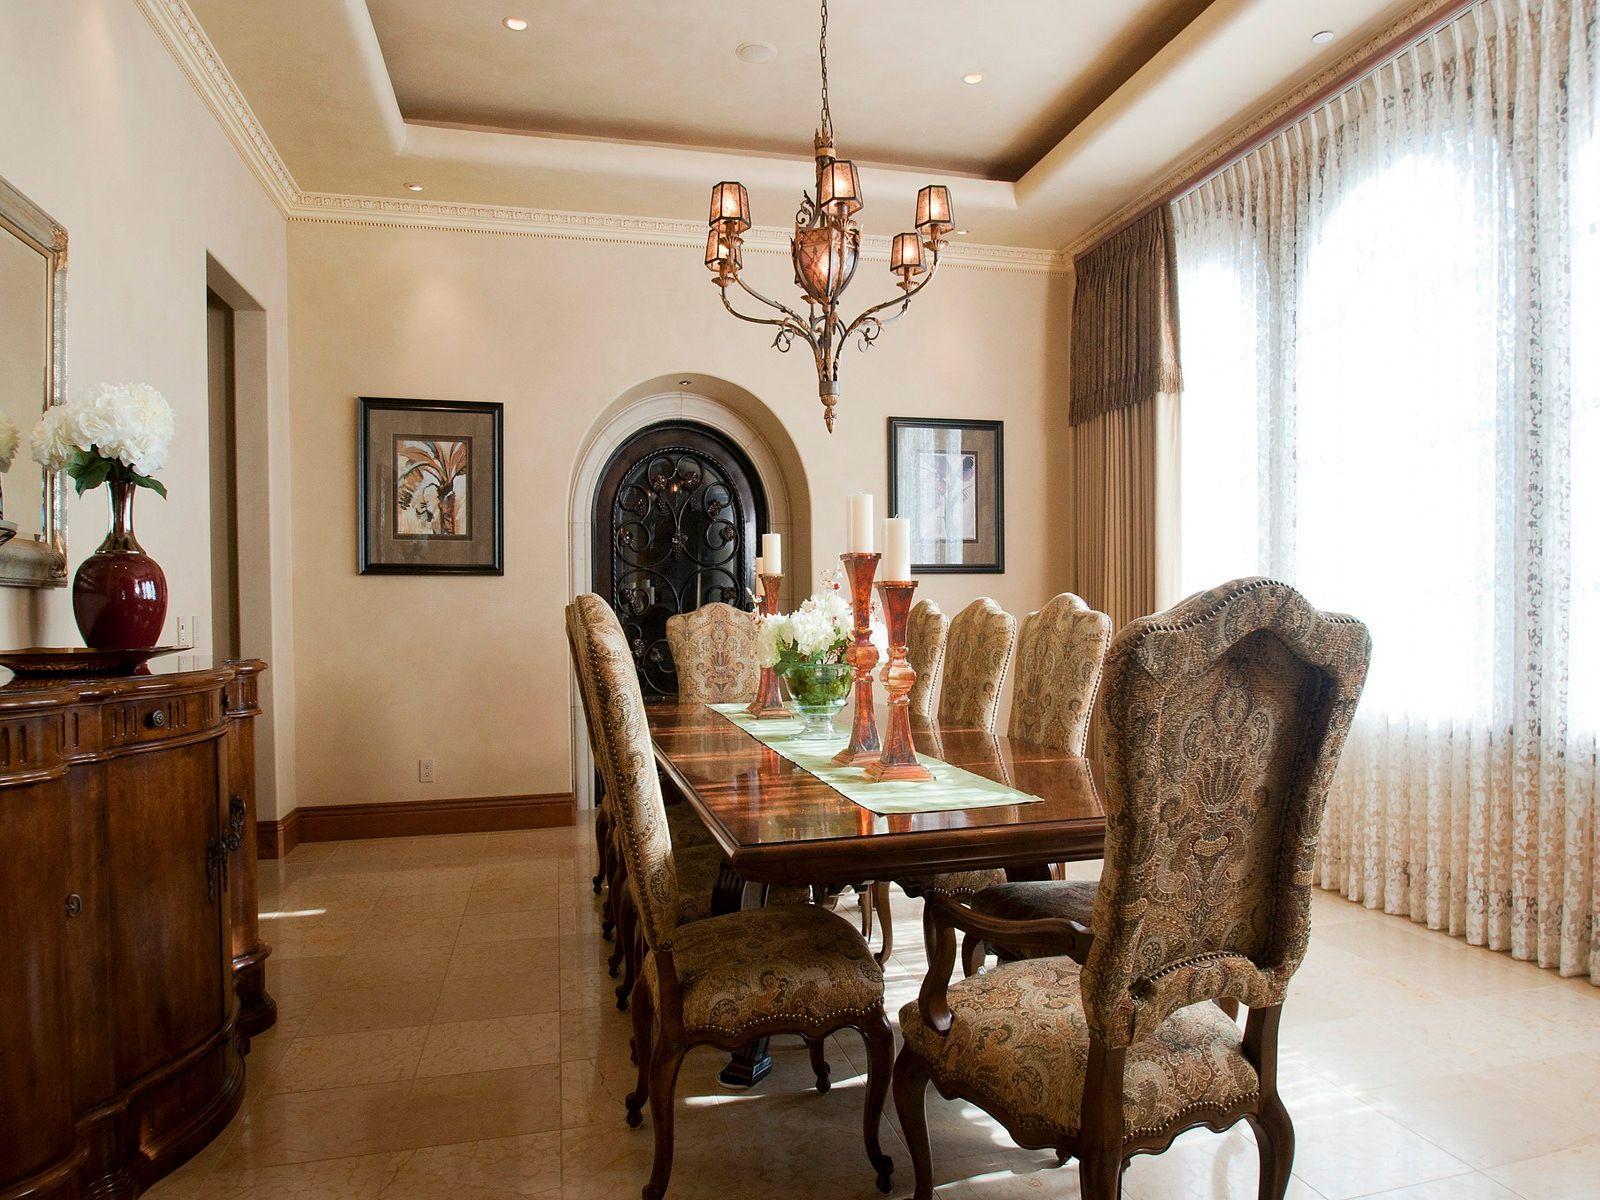 Dining room features Fine Art chandelier